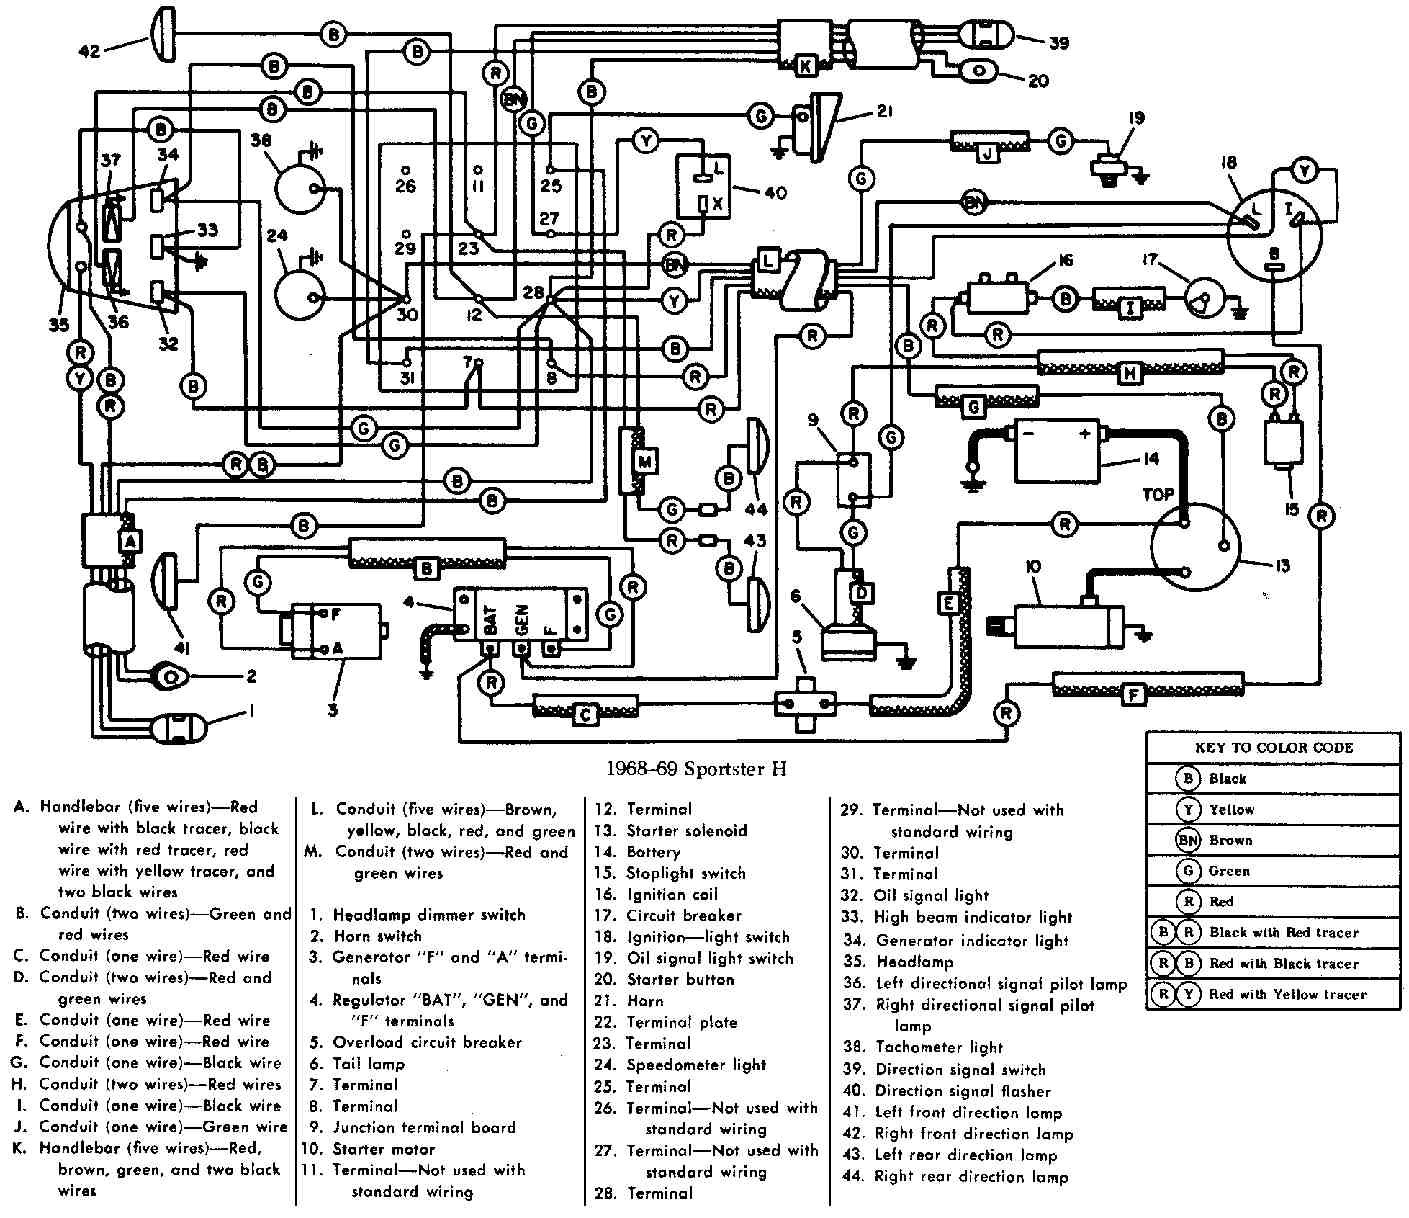 harley turn signal wiring diagram - harley davidson ignition switch diagram  free download wiring diagram harley